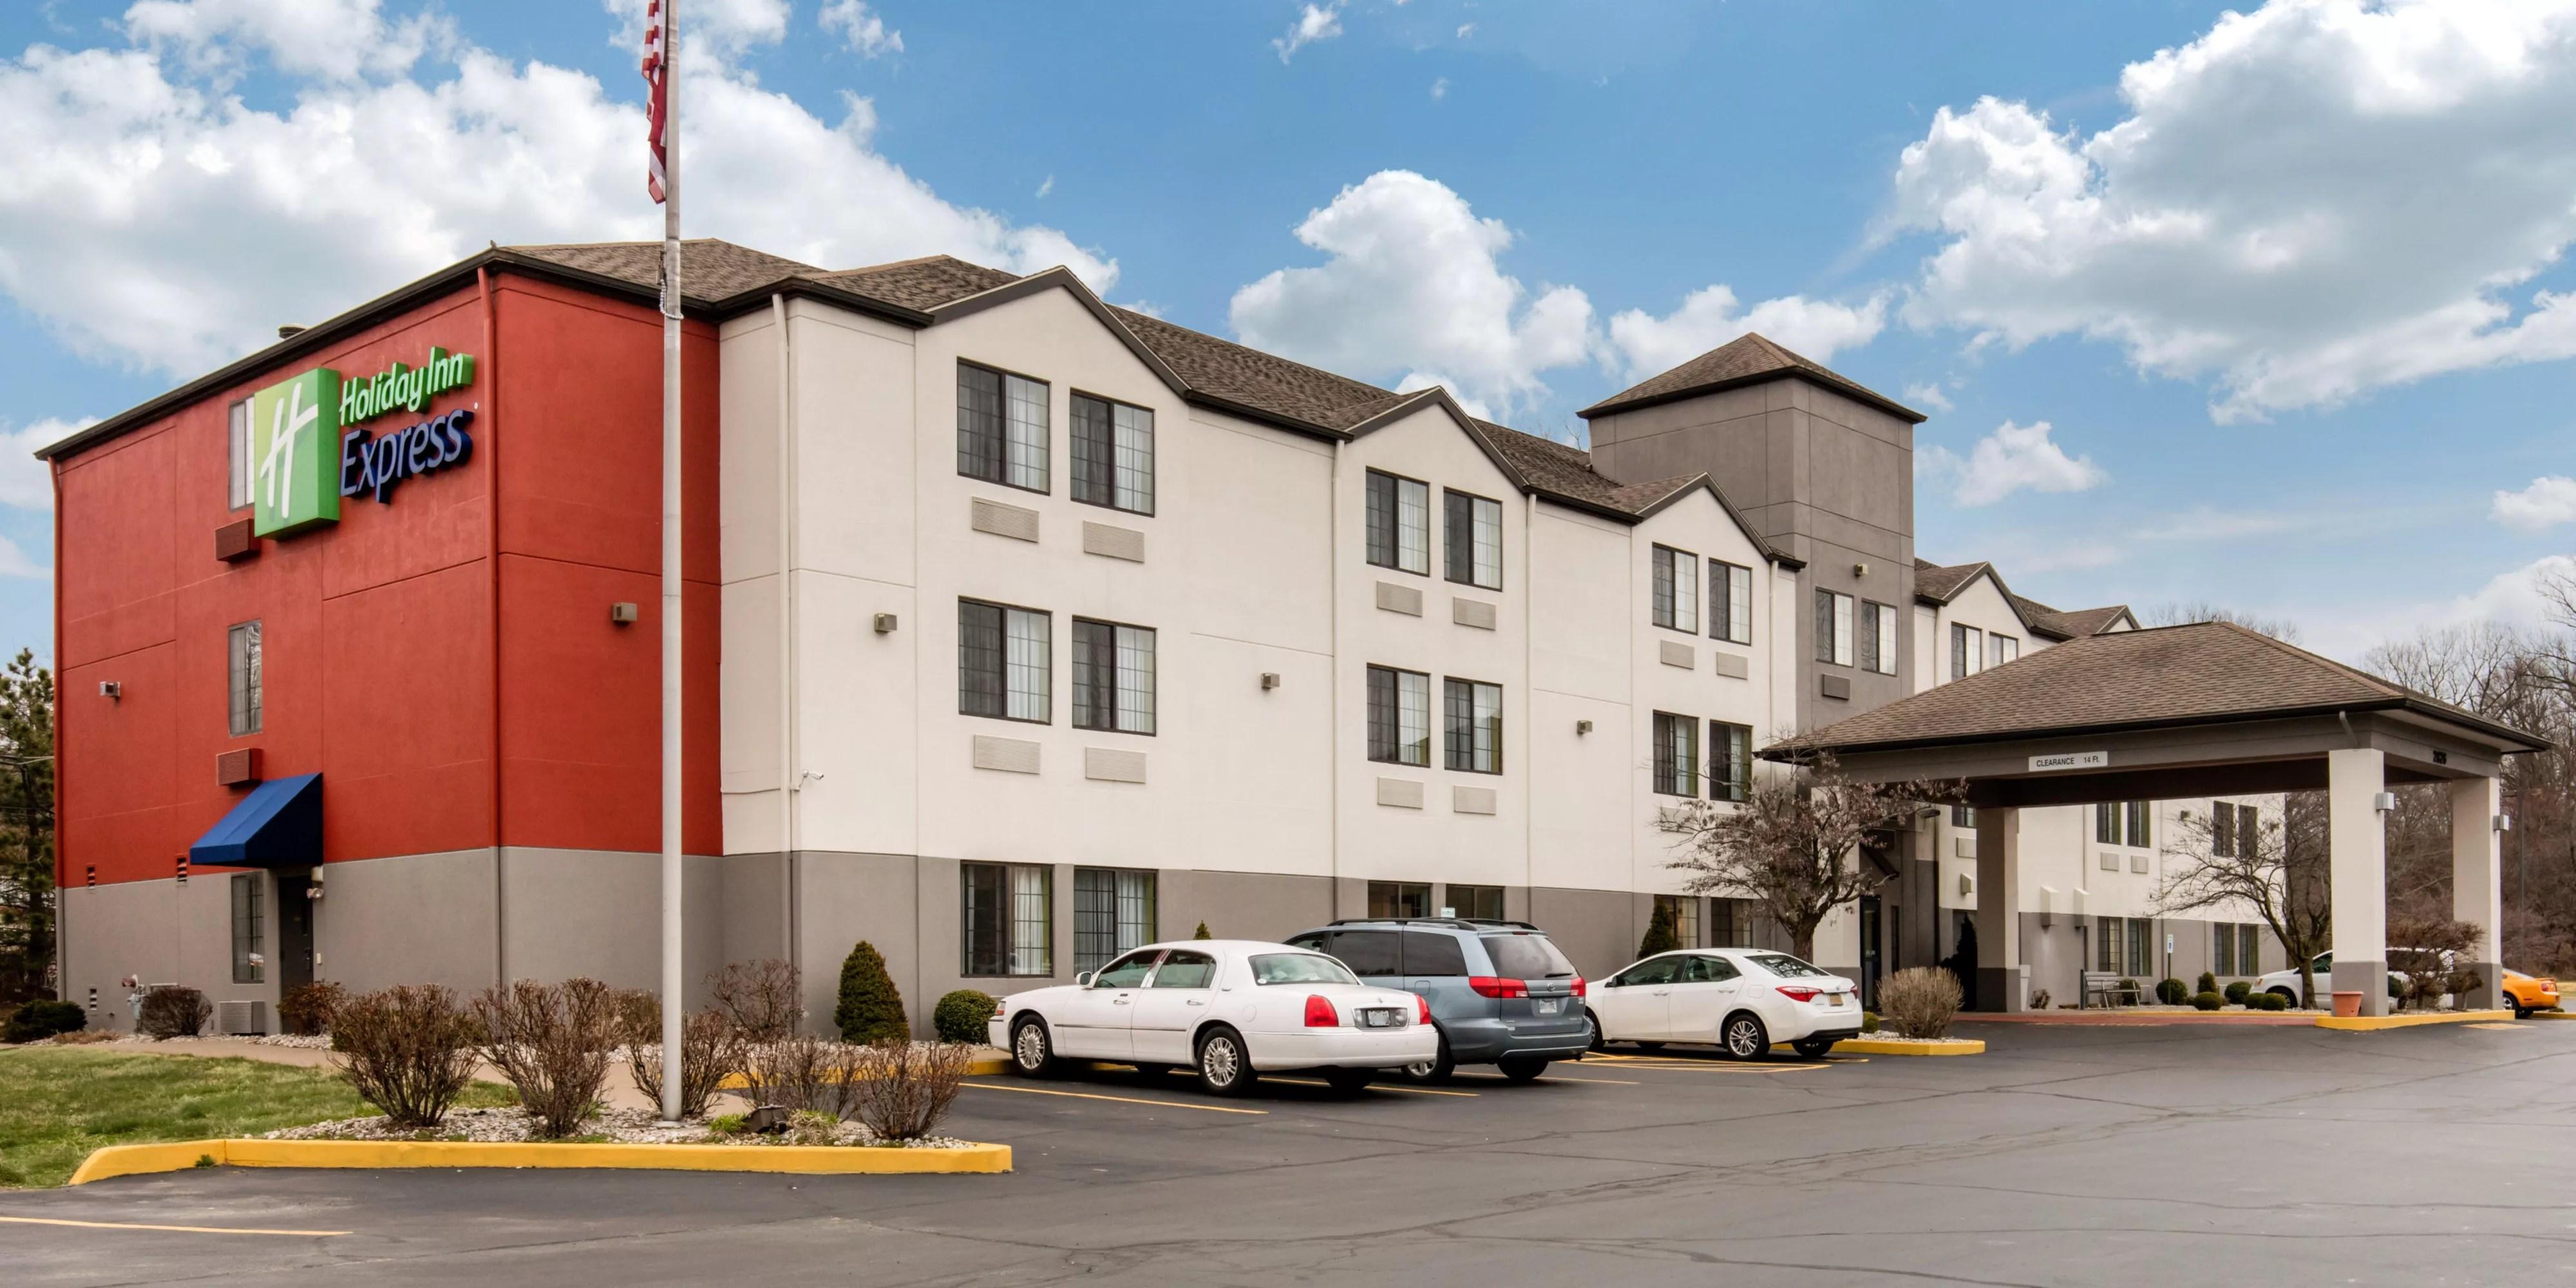 Holiday Inn Express Henderson N Evansville South Hotel By Ihg